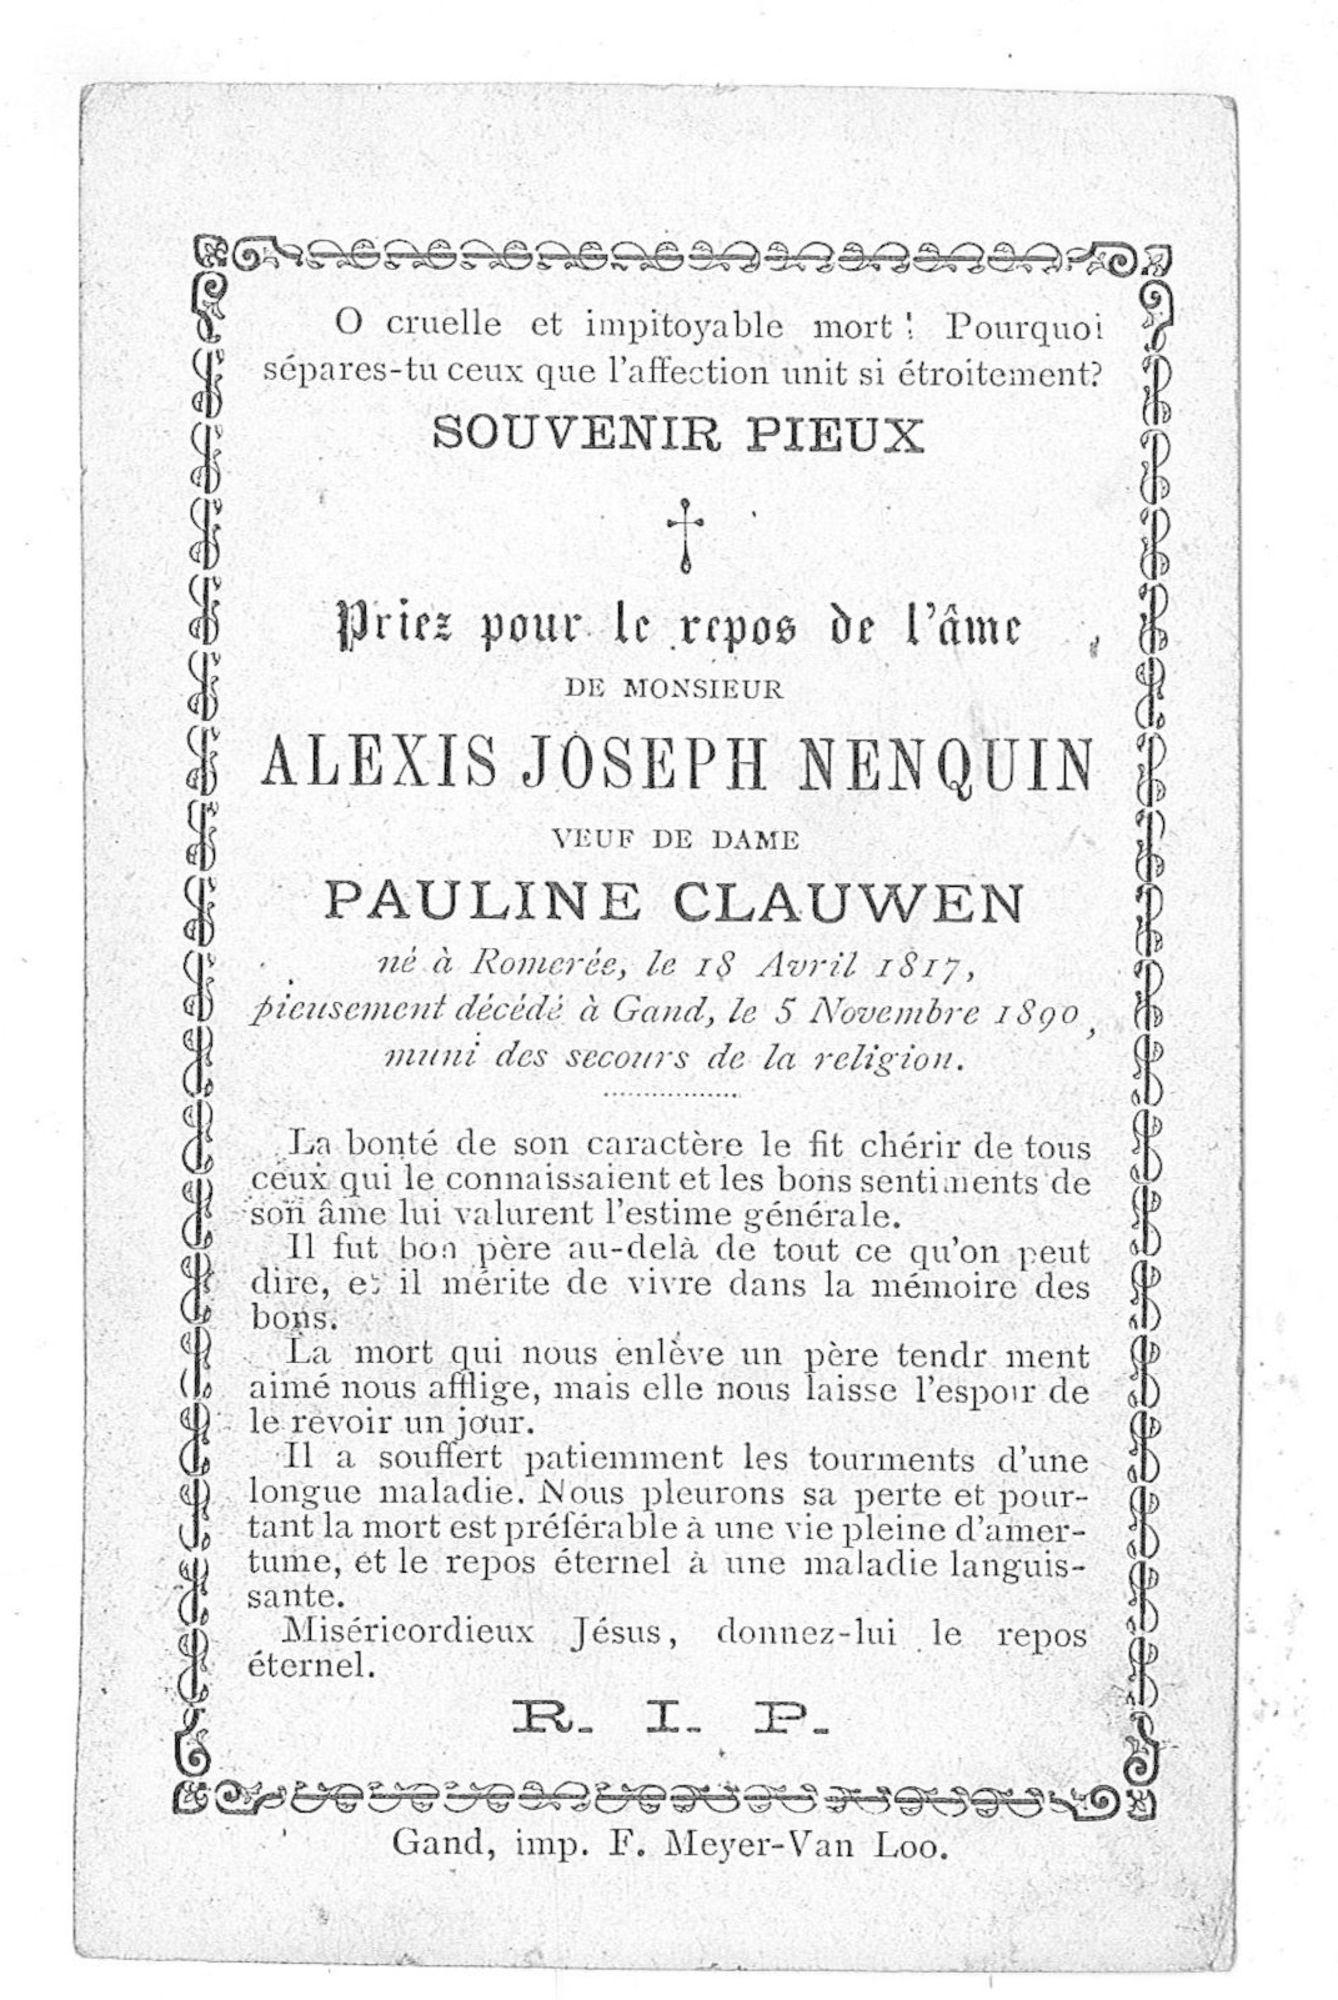 Alexis-Joseph Nenquin